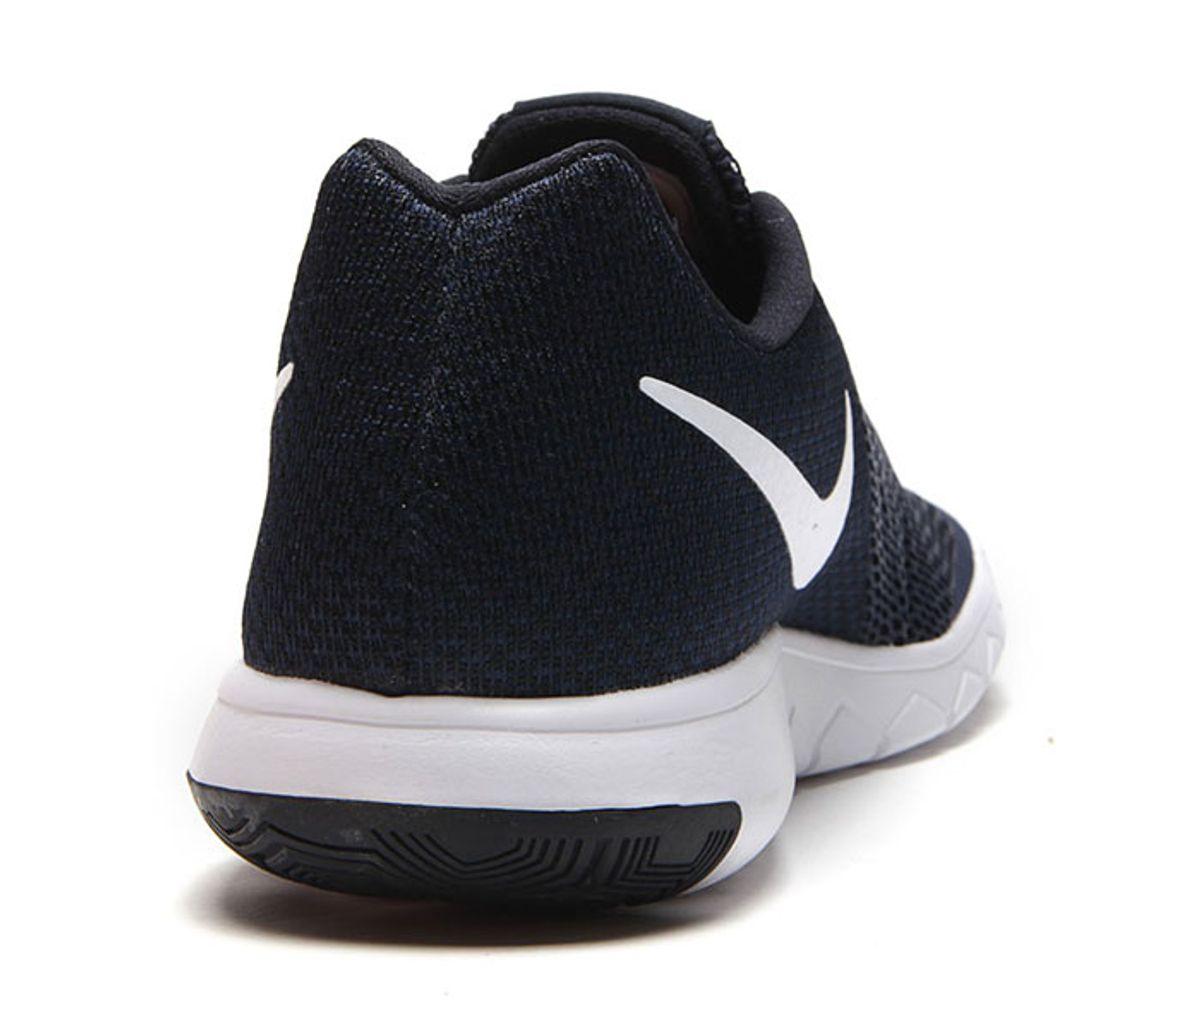 Derrotado Restringido mental  Tênis Nike Flex Experience Rn 6 Original Sku: 1588442   Tênis Masculino Tênis  Nike Flex Experience Rn 6 Nunca Usado 46711126   enjoei